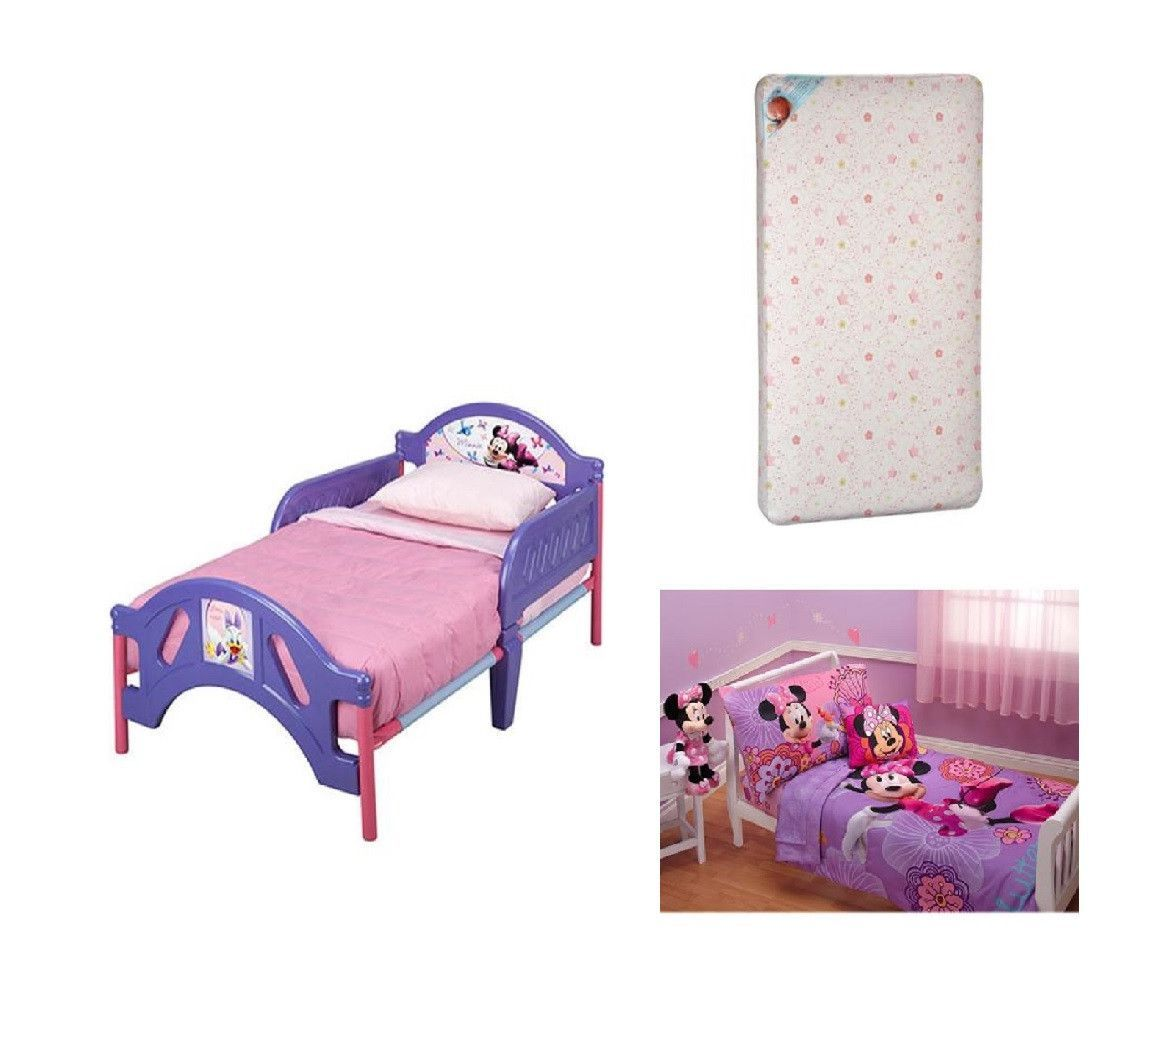 Toddler Character Bed Toddler Mattress And Complete Bedding Set Bed Toddler Bed Sleep Safe Bed